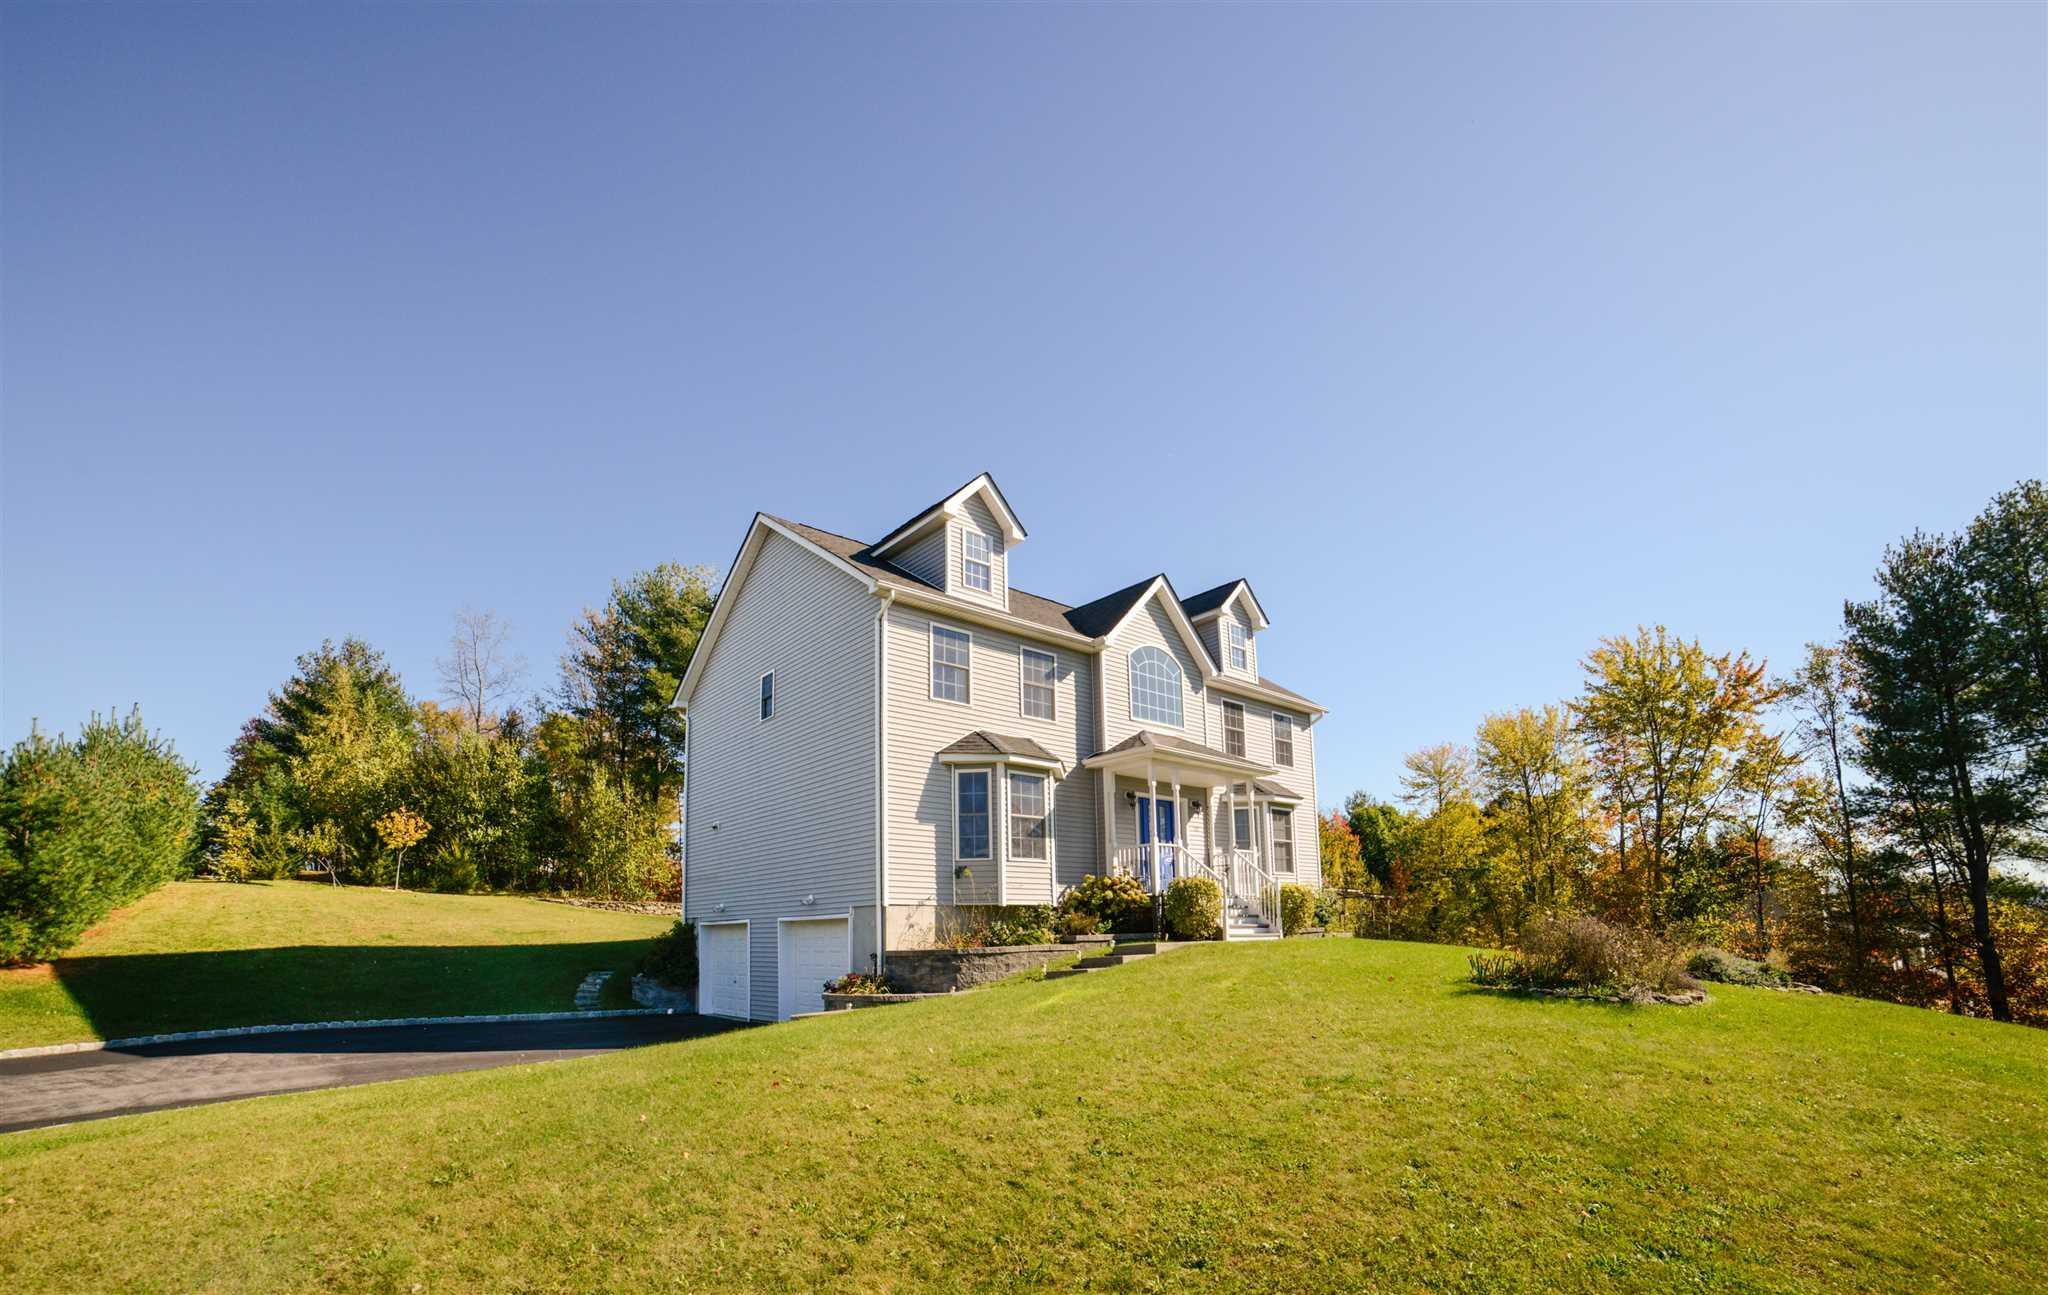 Additional photo for property listing at 112 PROSPECT Street 112 PROSPECT Street Marlboro, New York 12542 United States